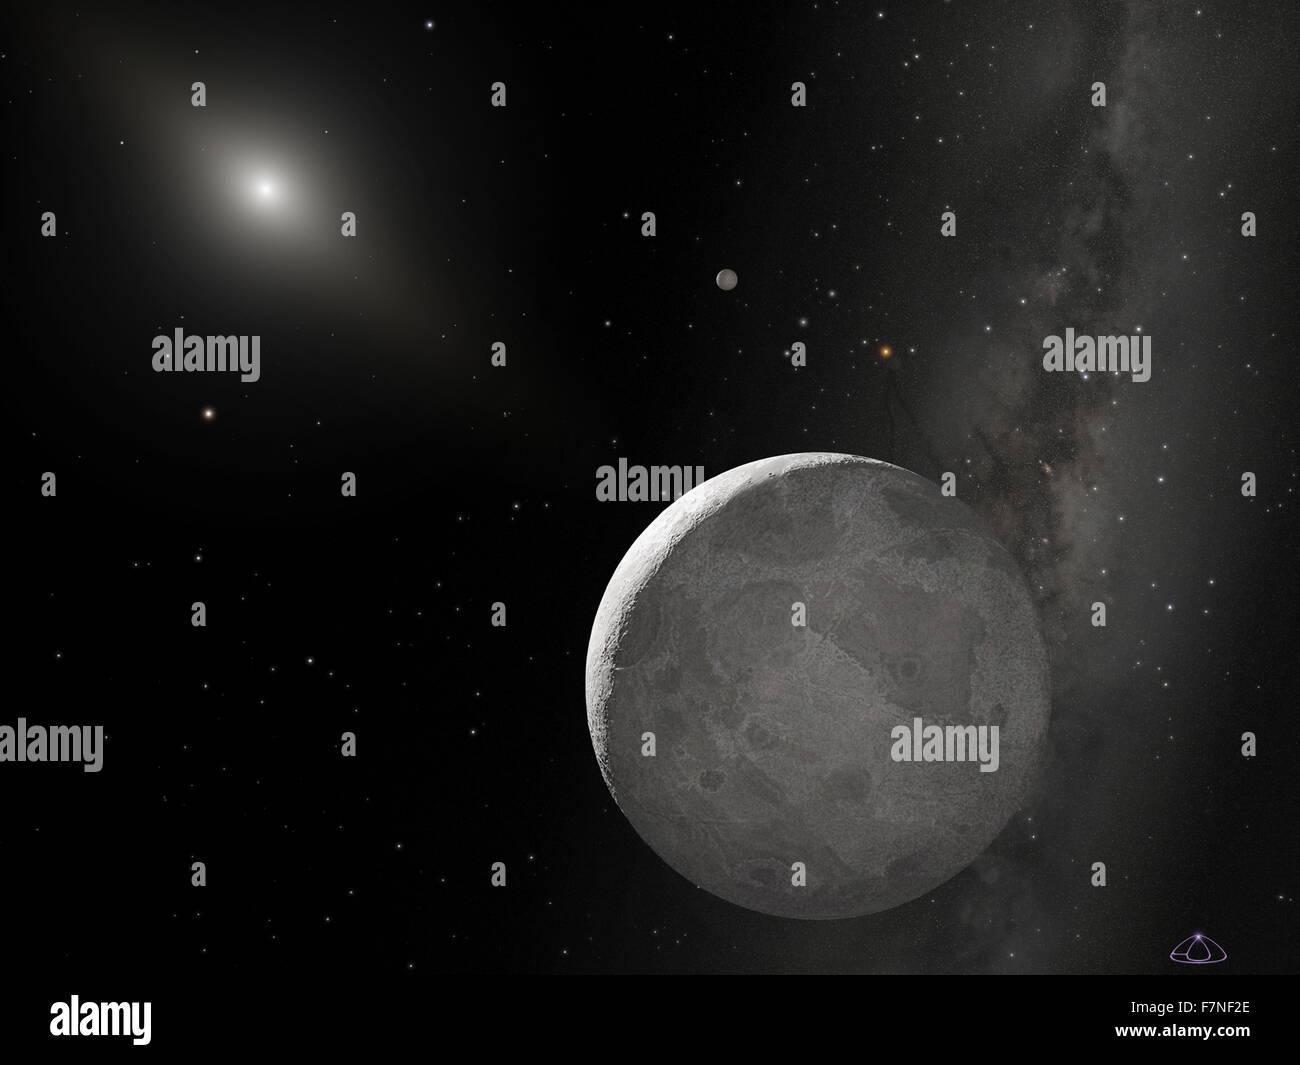 Hubble teleskop bild des zehnten planeten derzeit den spitznamen